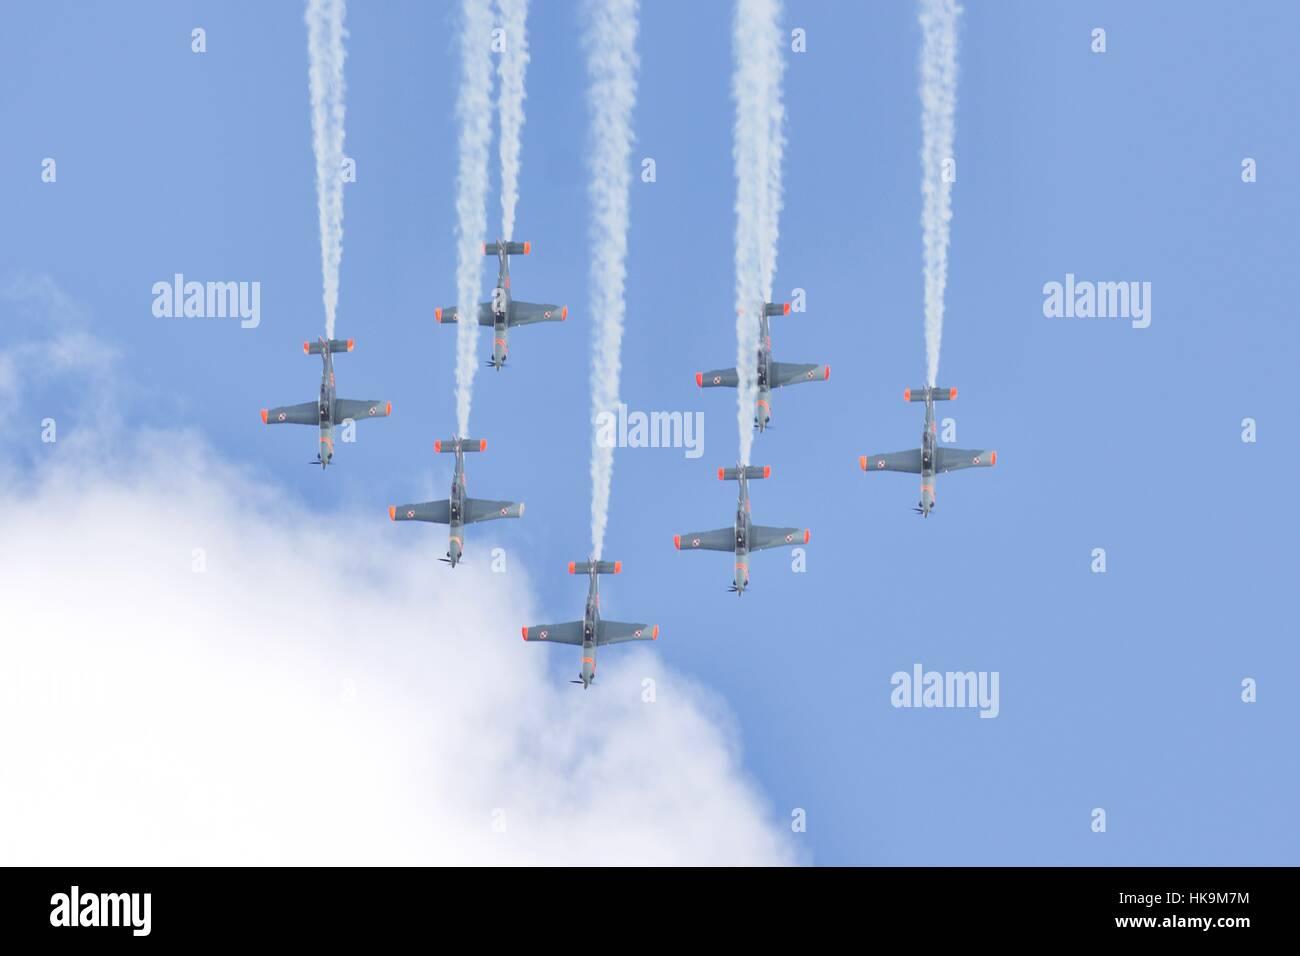 Orlik aerobatic display team - Stock Image